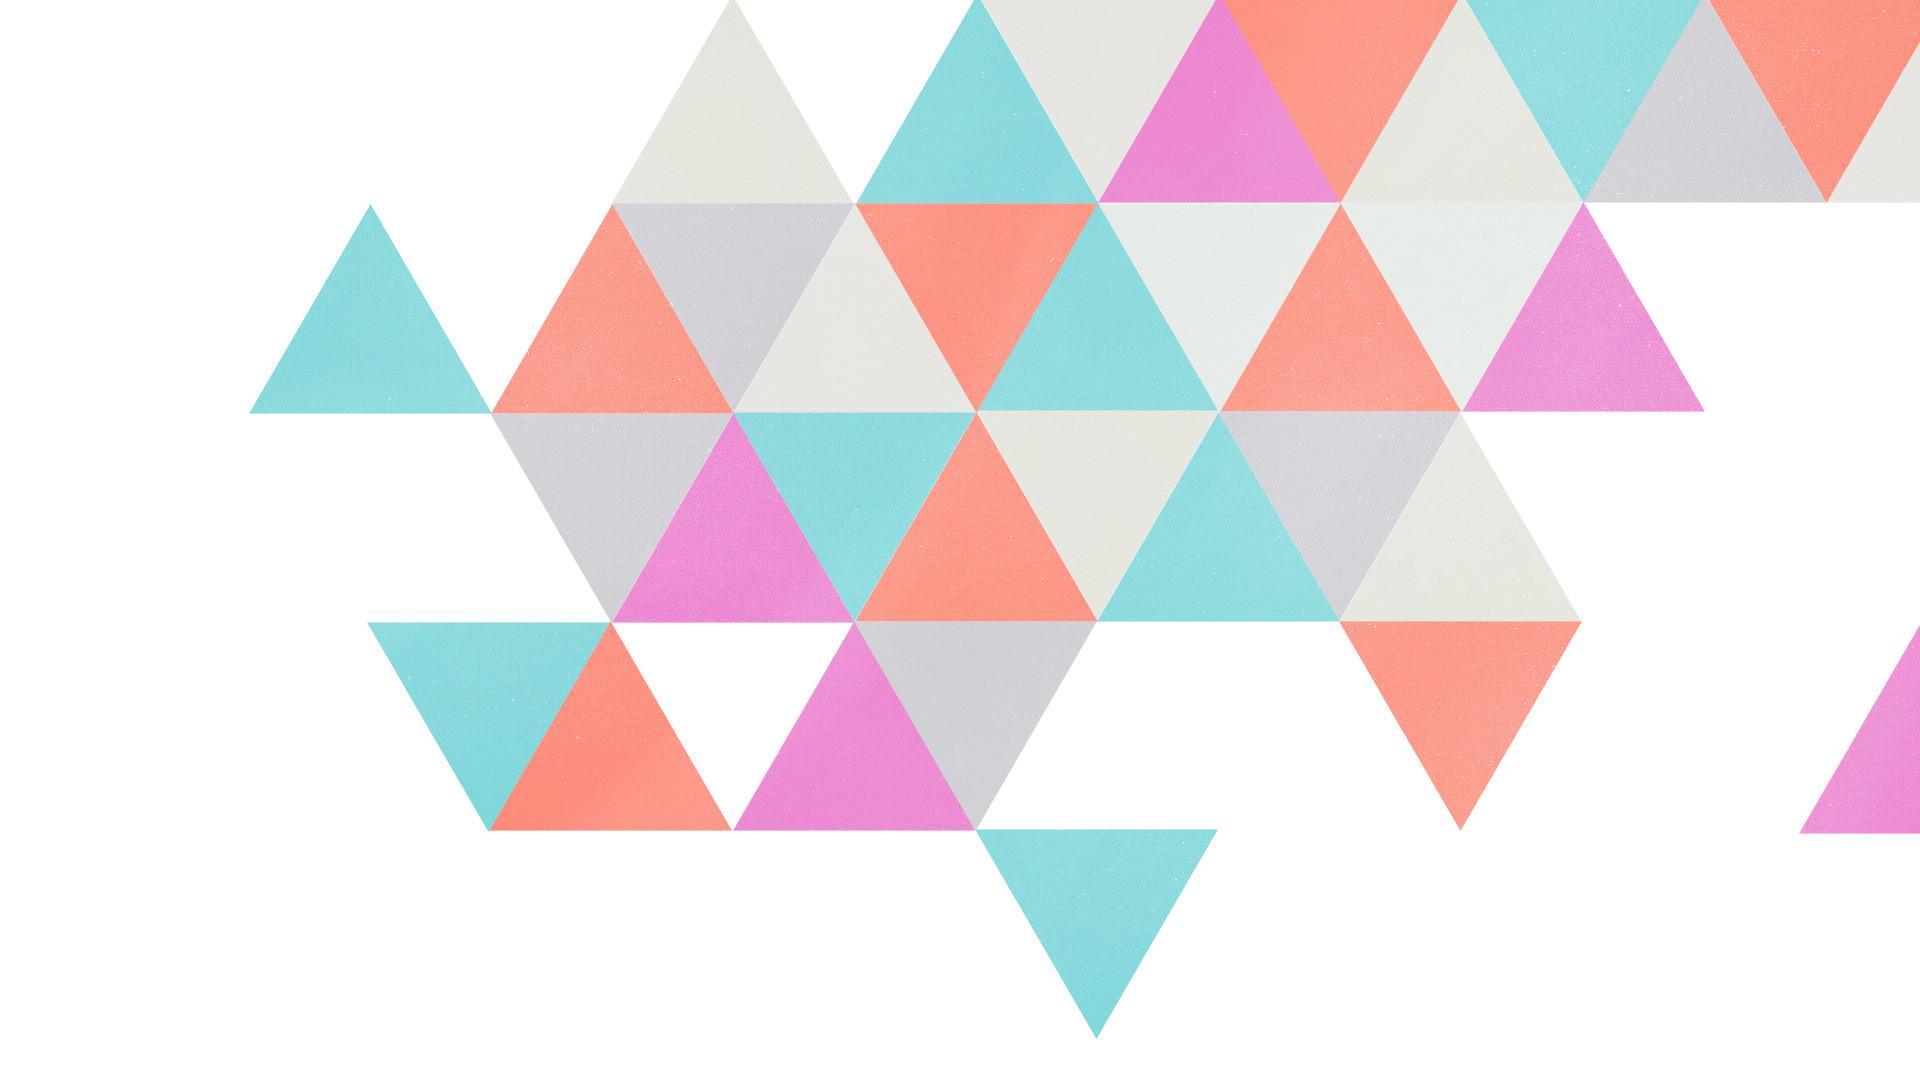 Hd Geometric Wallpaper 82 Images